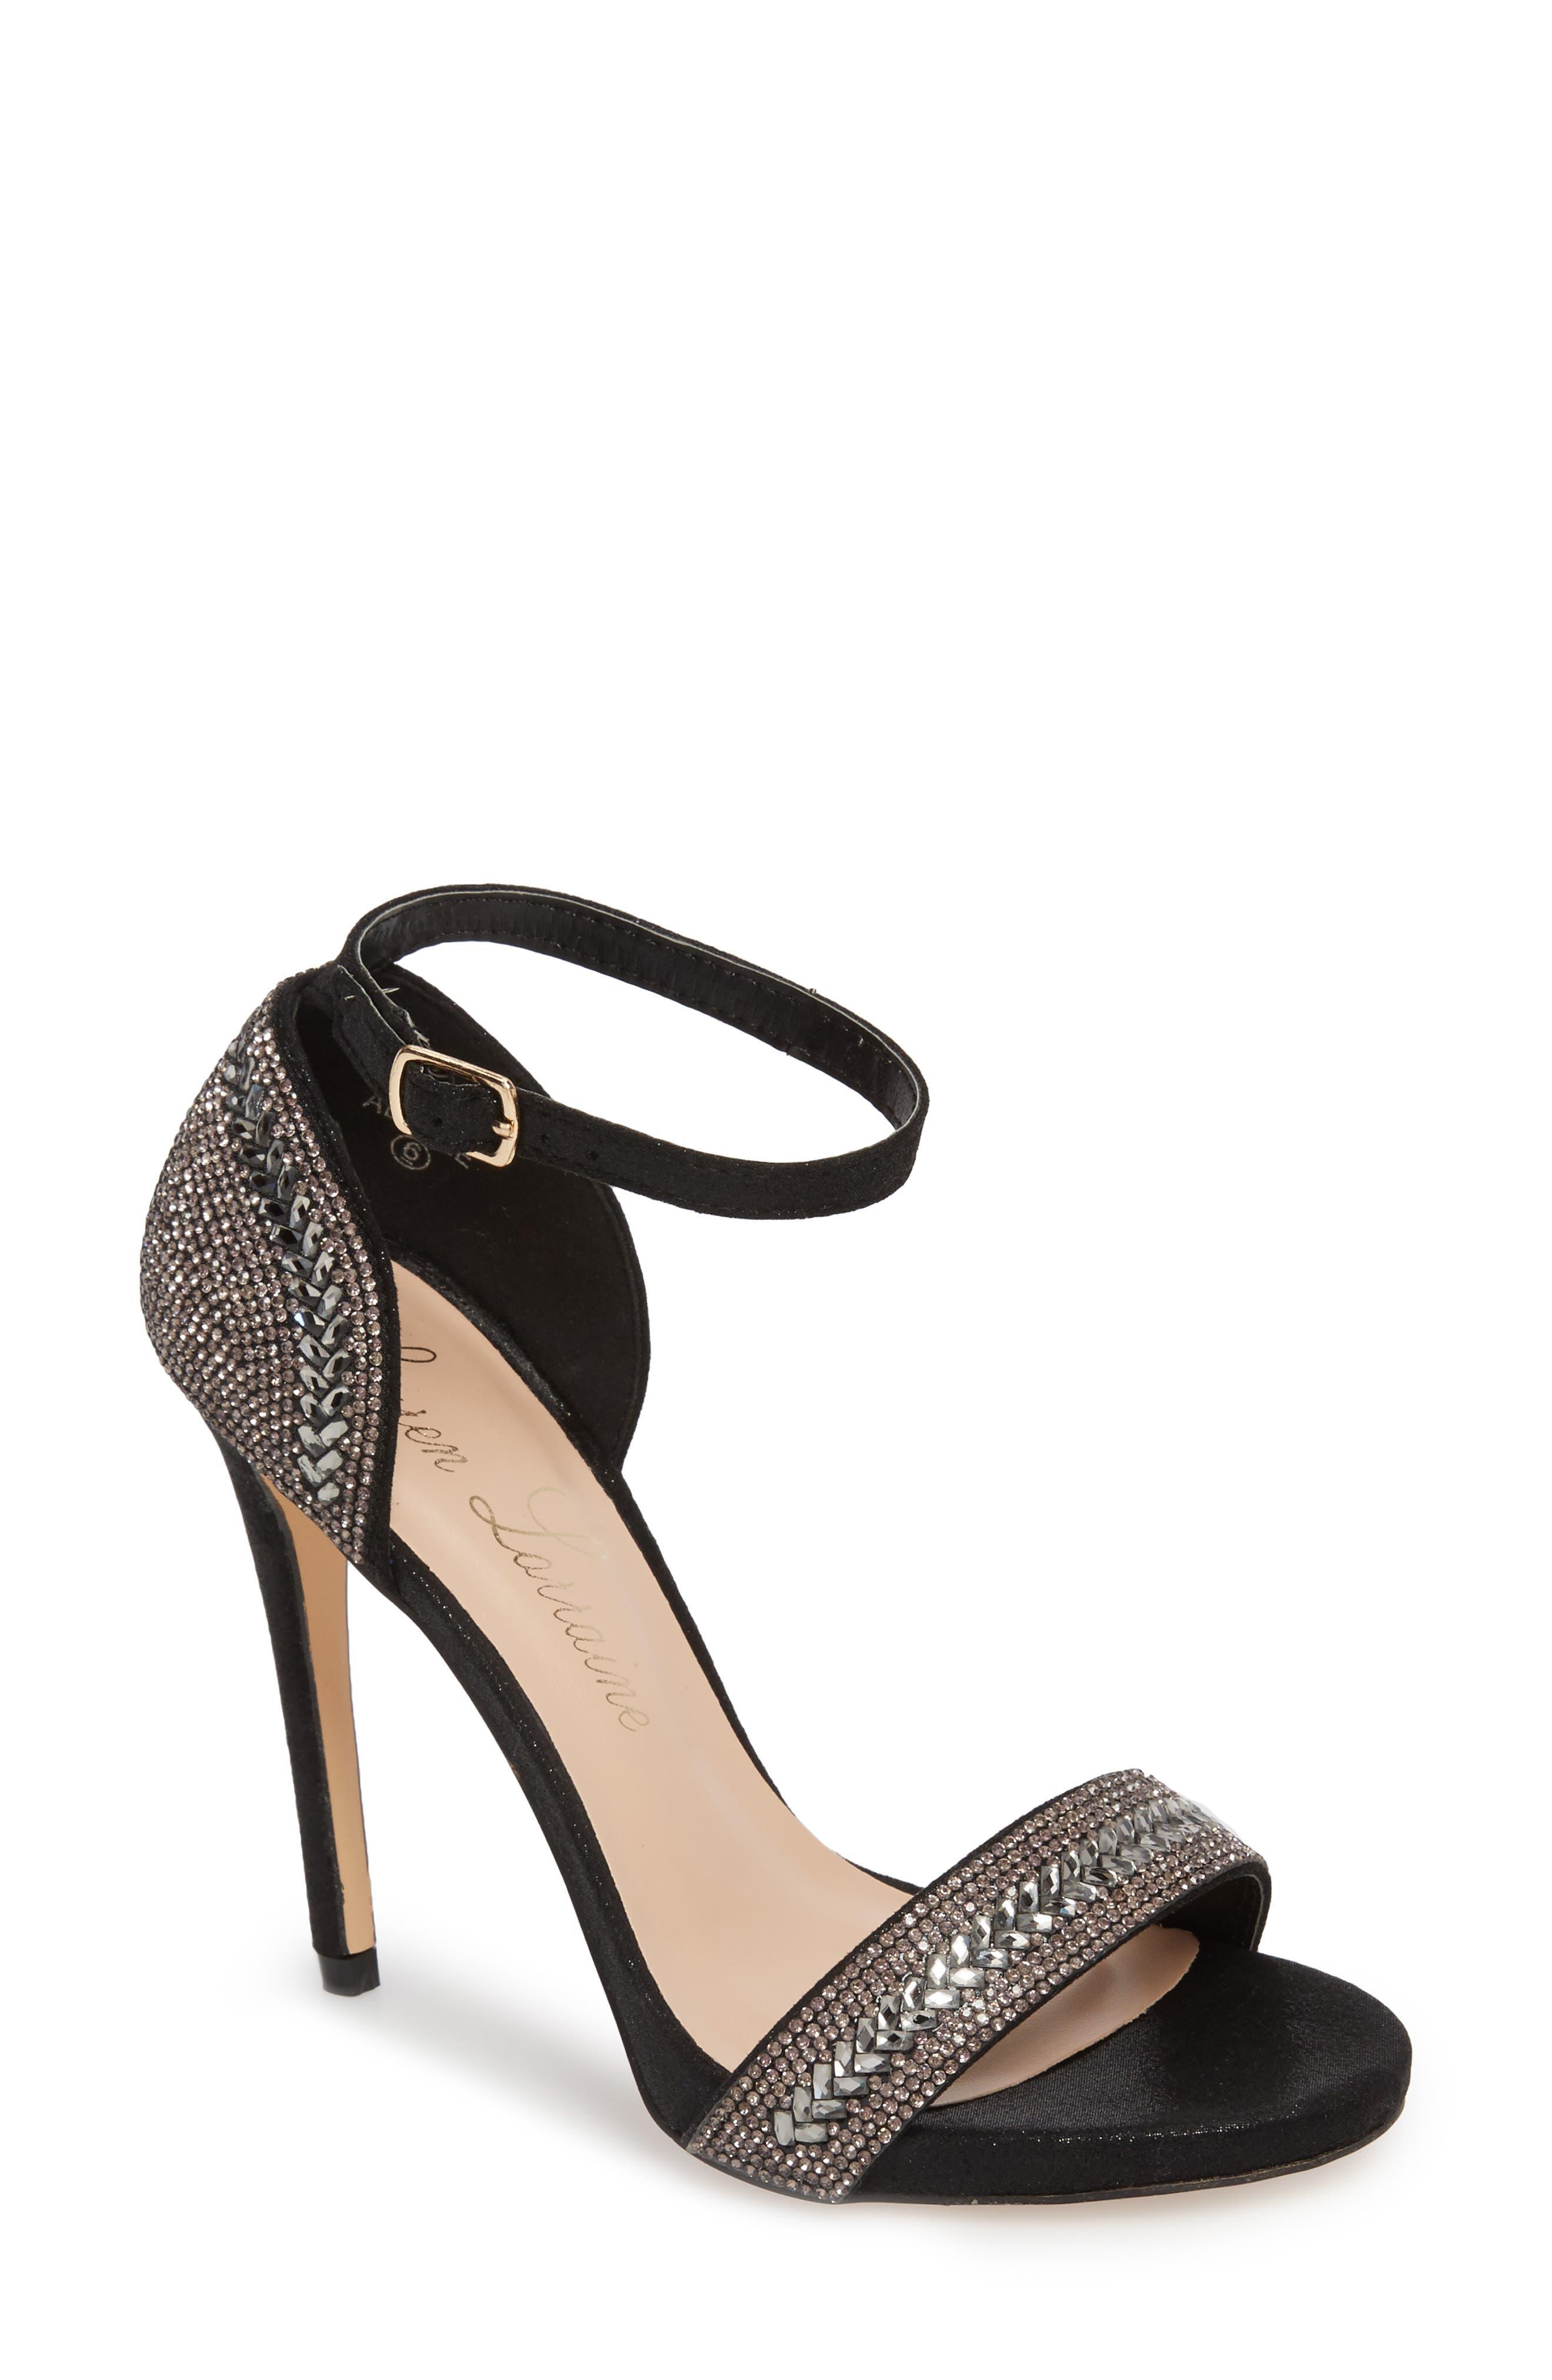 Main Image - Lauren Lorraine Adelle Embellished Sandal (Women)